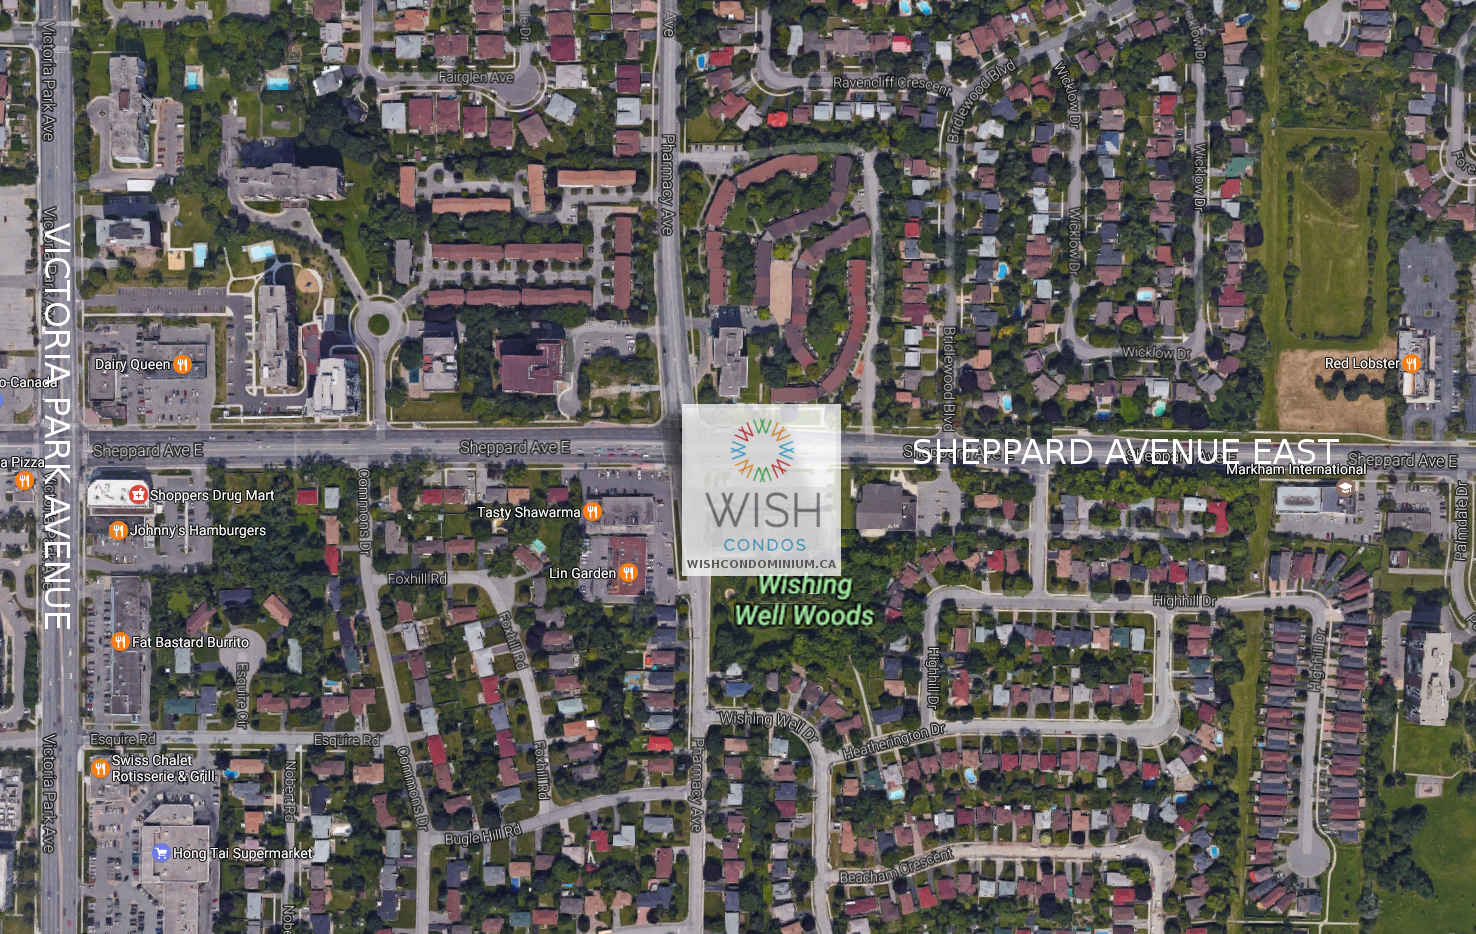 Wish-Condominiums-Satellite-Map-w1476.jpg